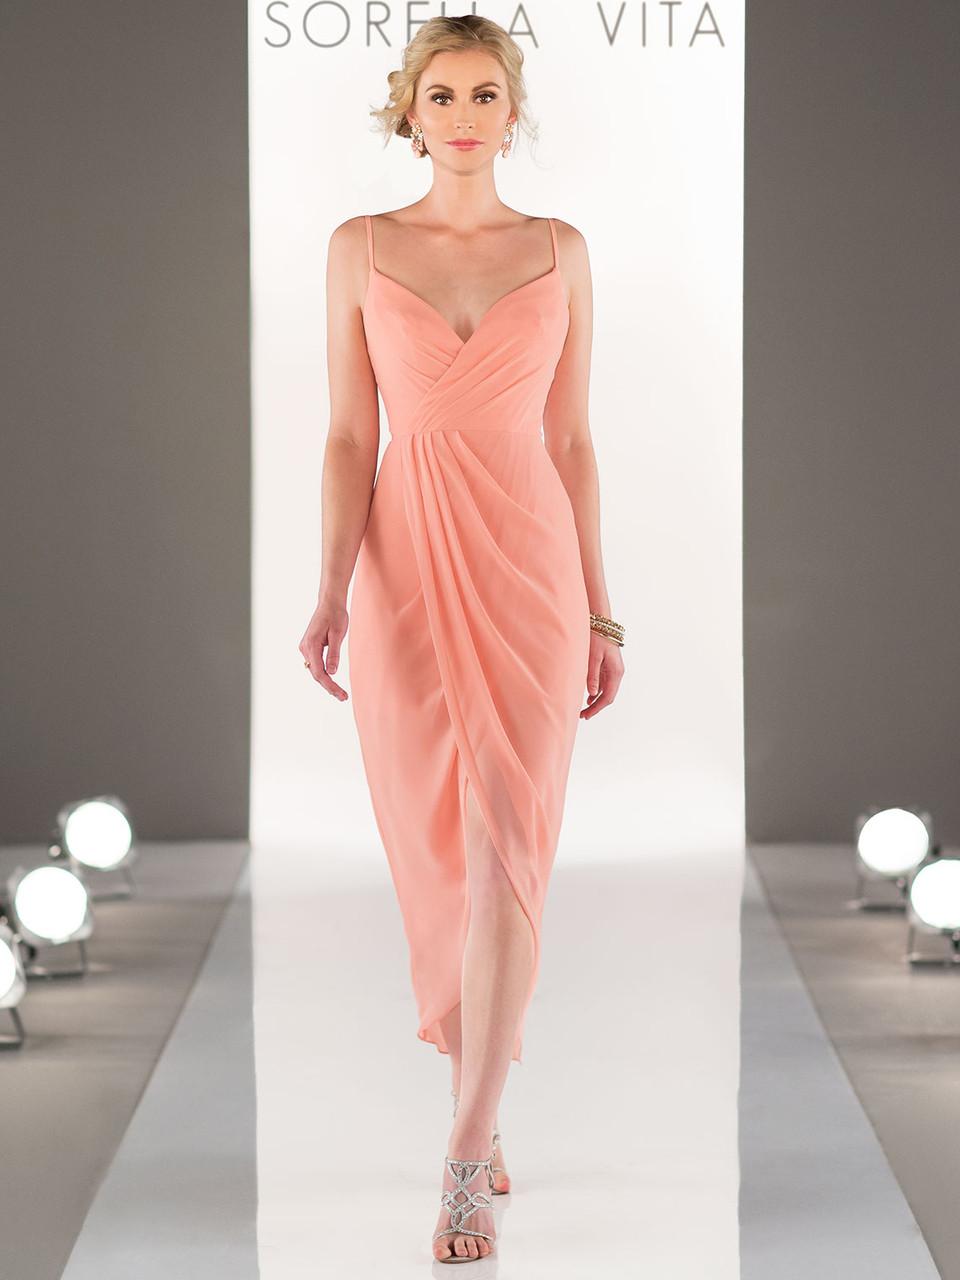 f3d01226fc8 Sorella Vita 8776 Chiffon Midi Length Bridesmaid Dress ...